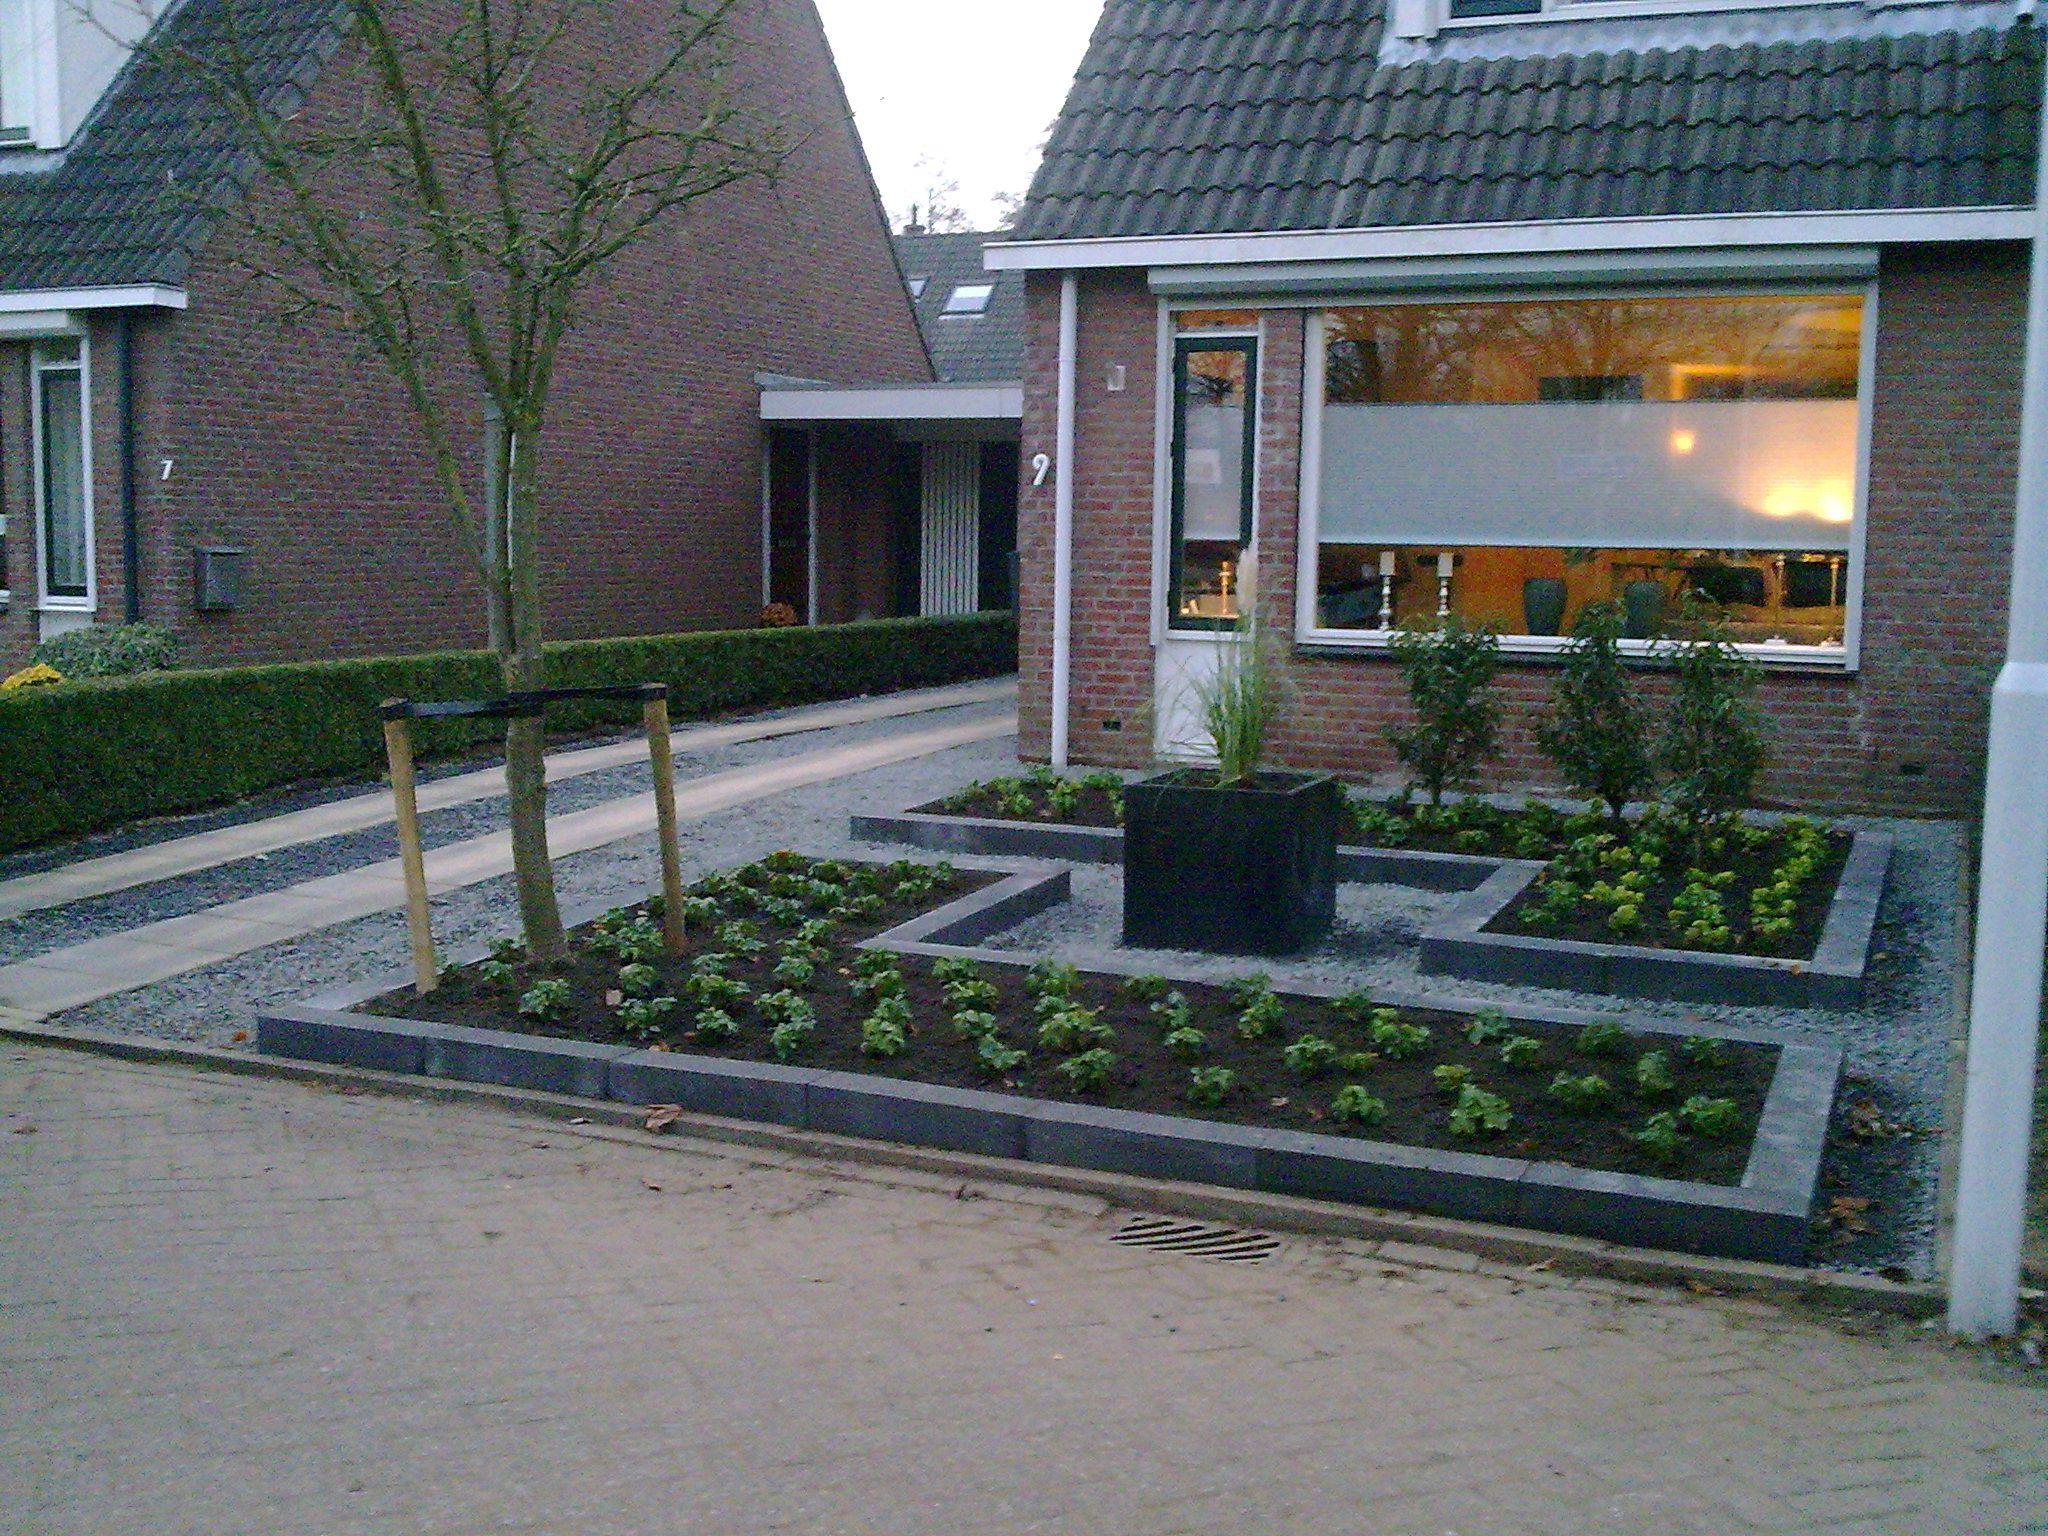 Badkamer aangelegde tuin ideeën van bovenste plank tuin indeling